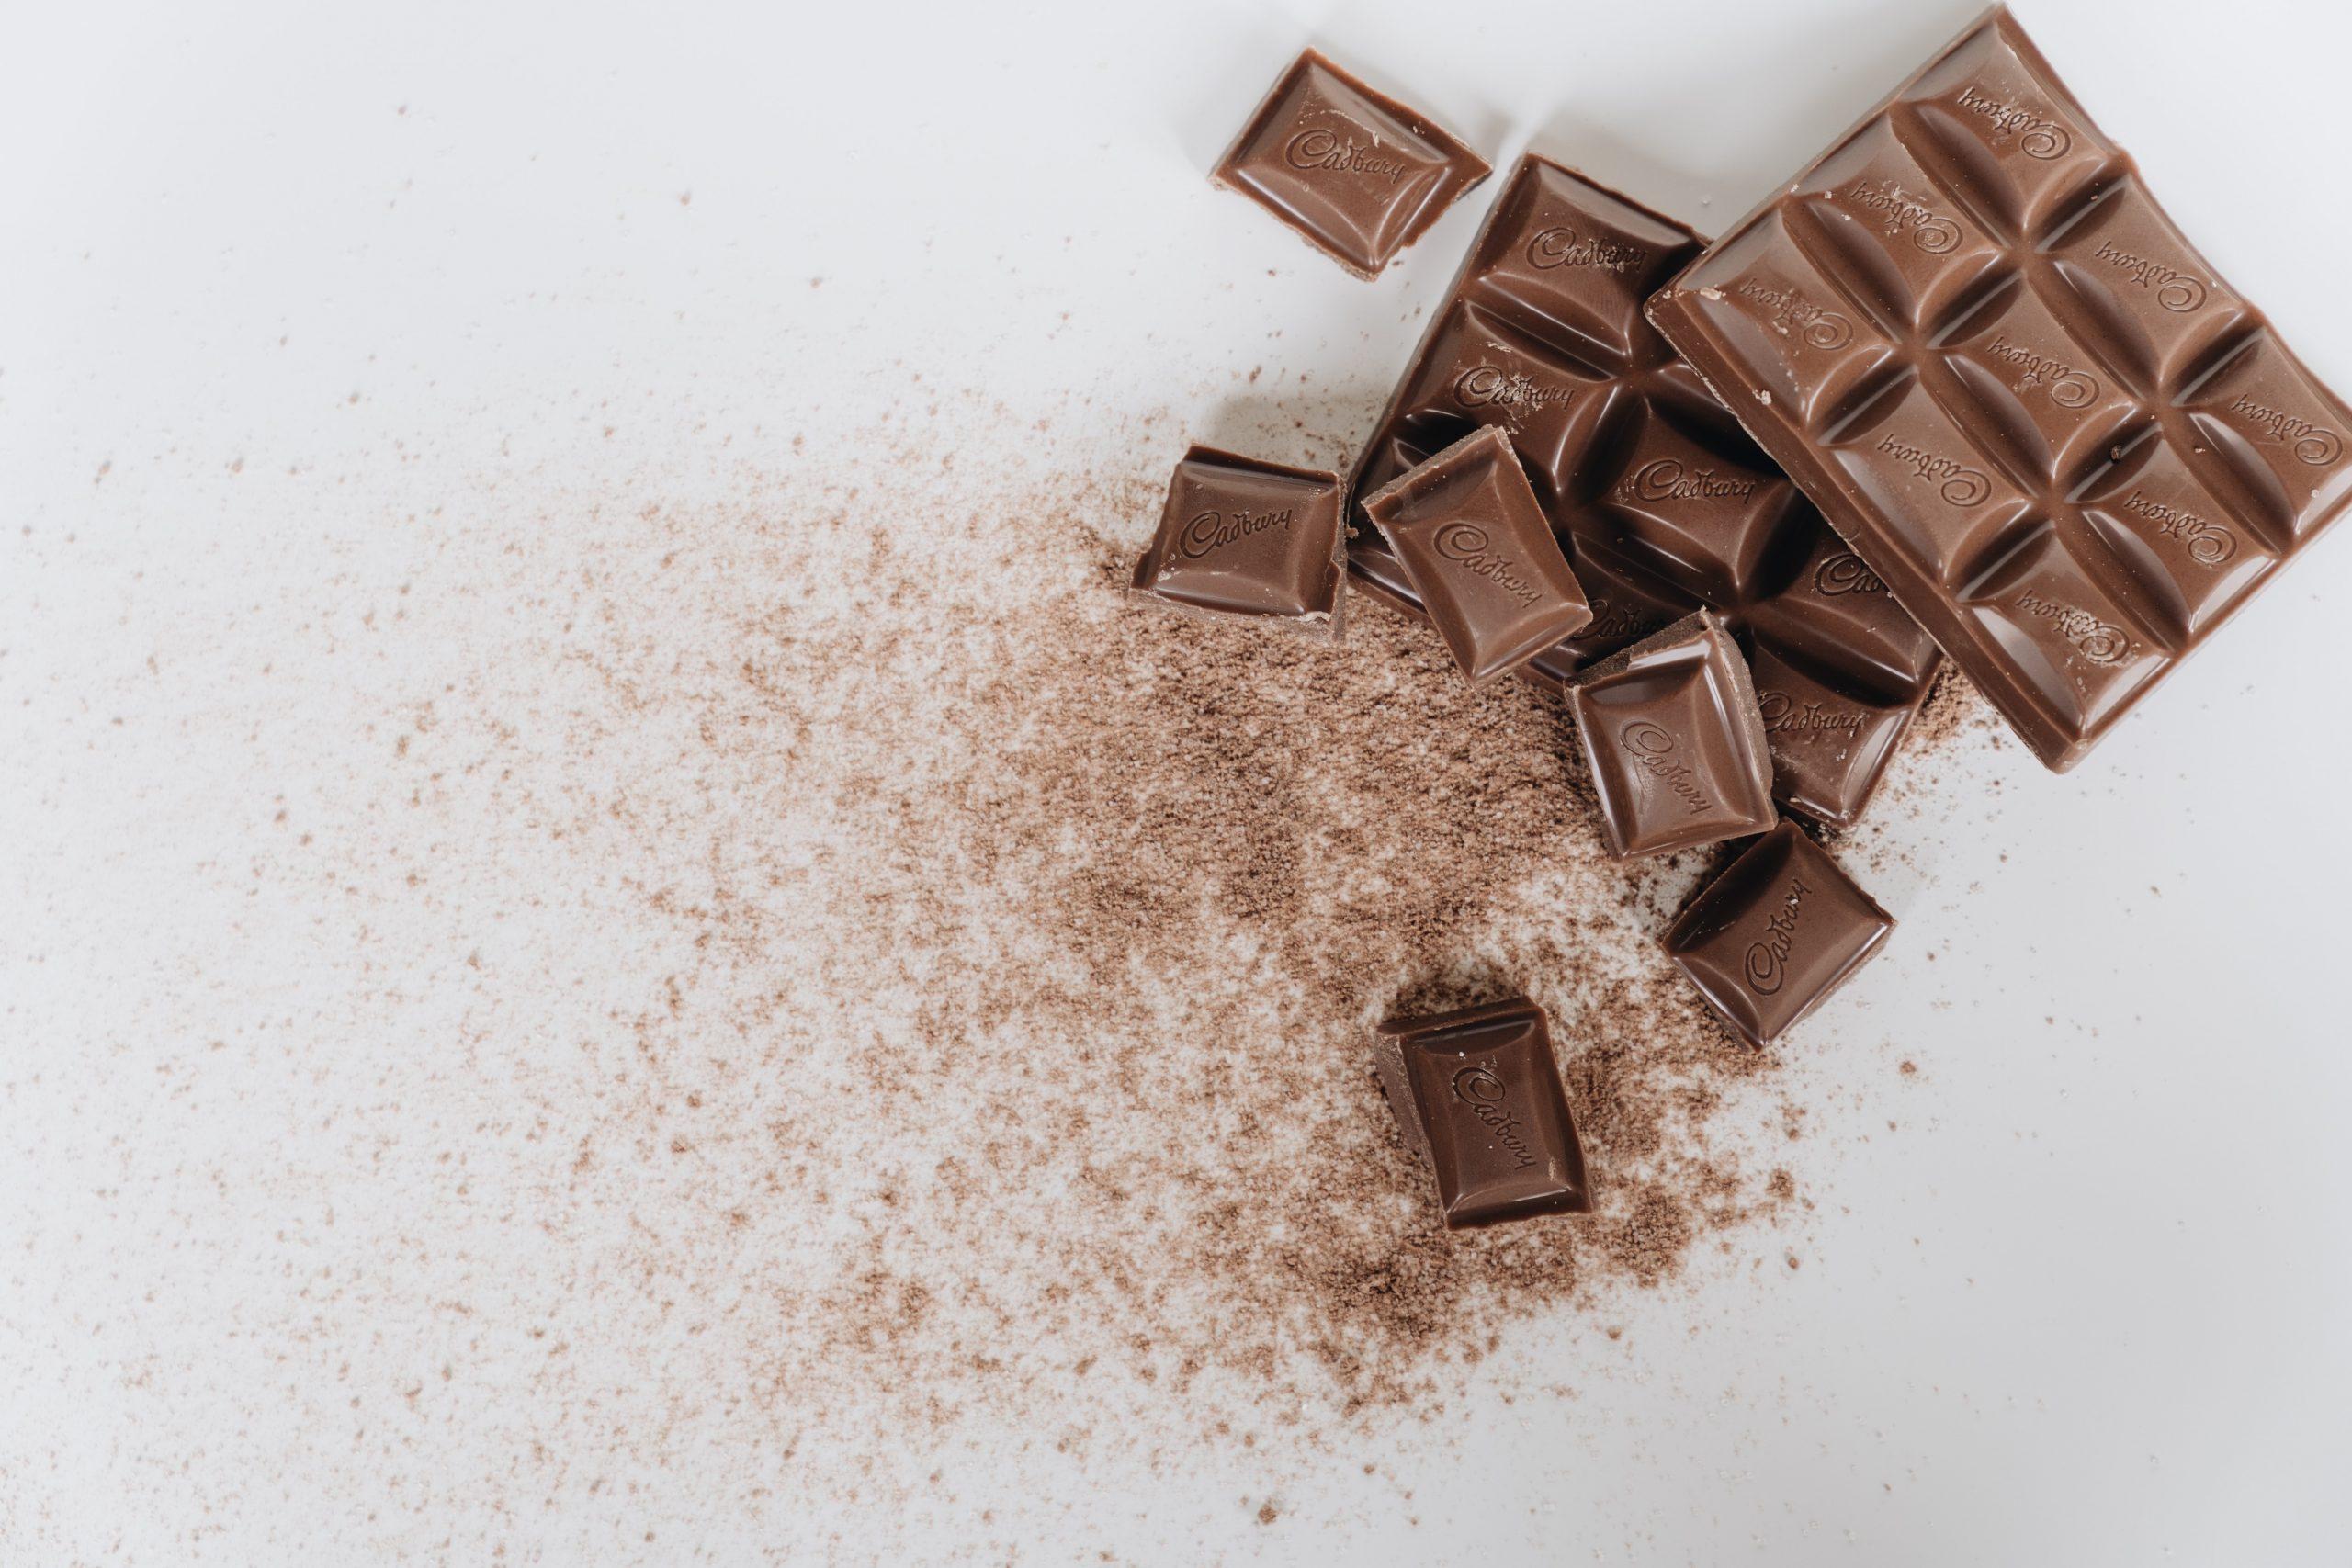 Milk chocolate bar on white surface.